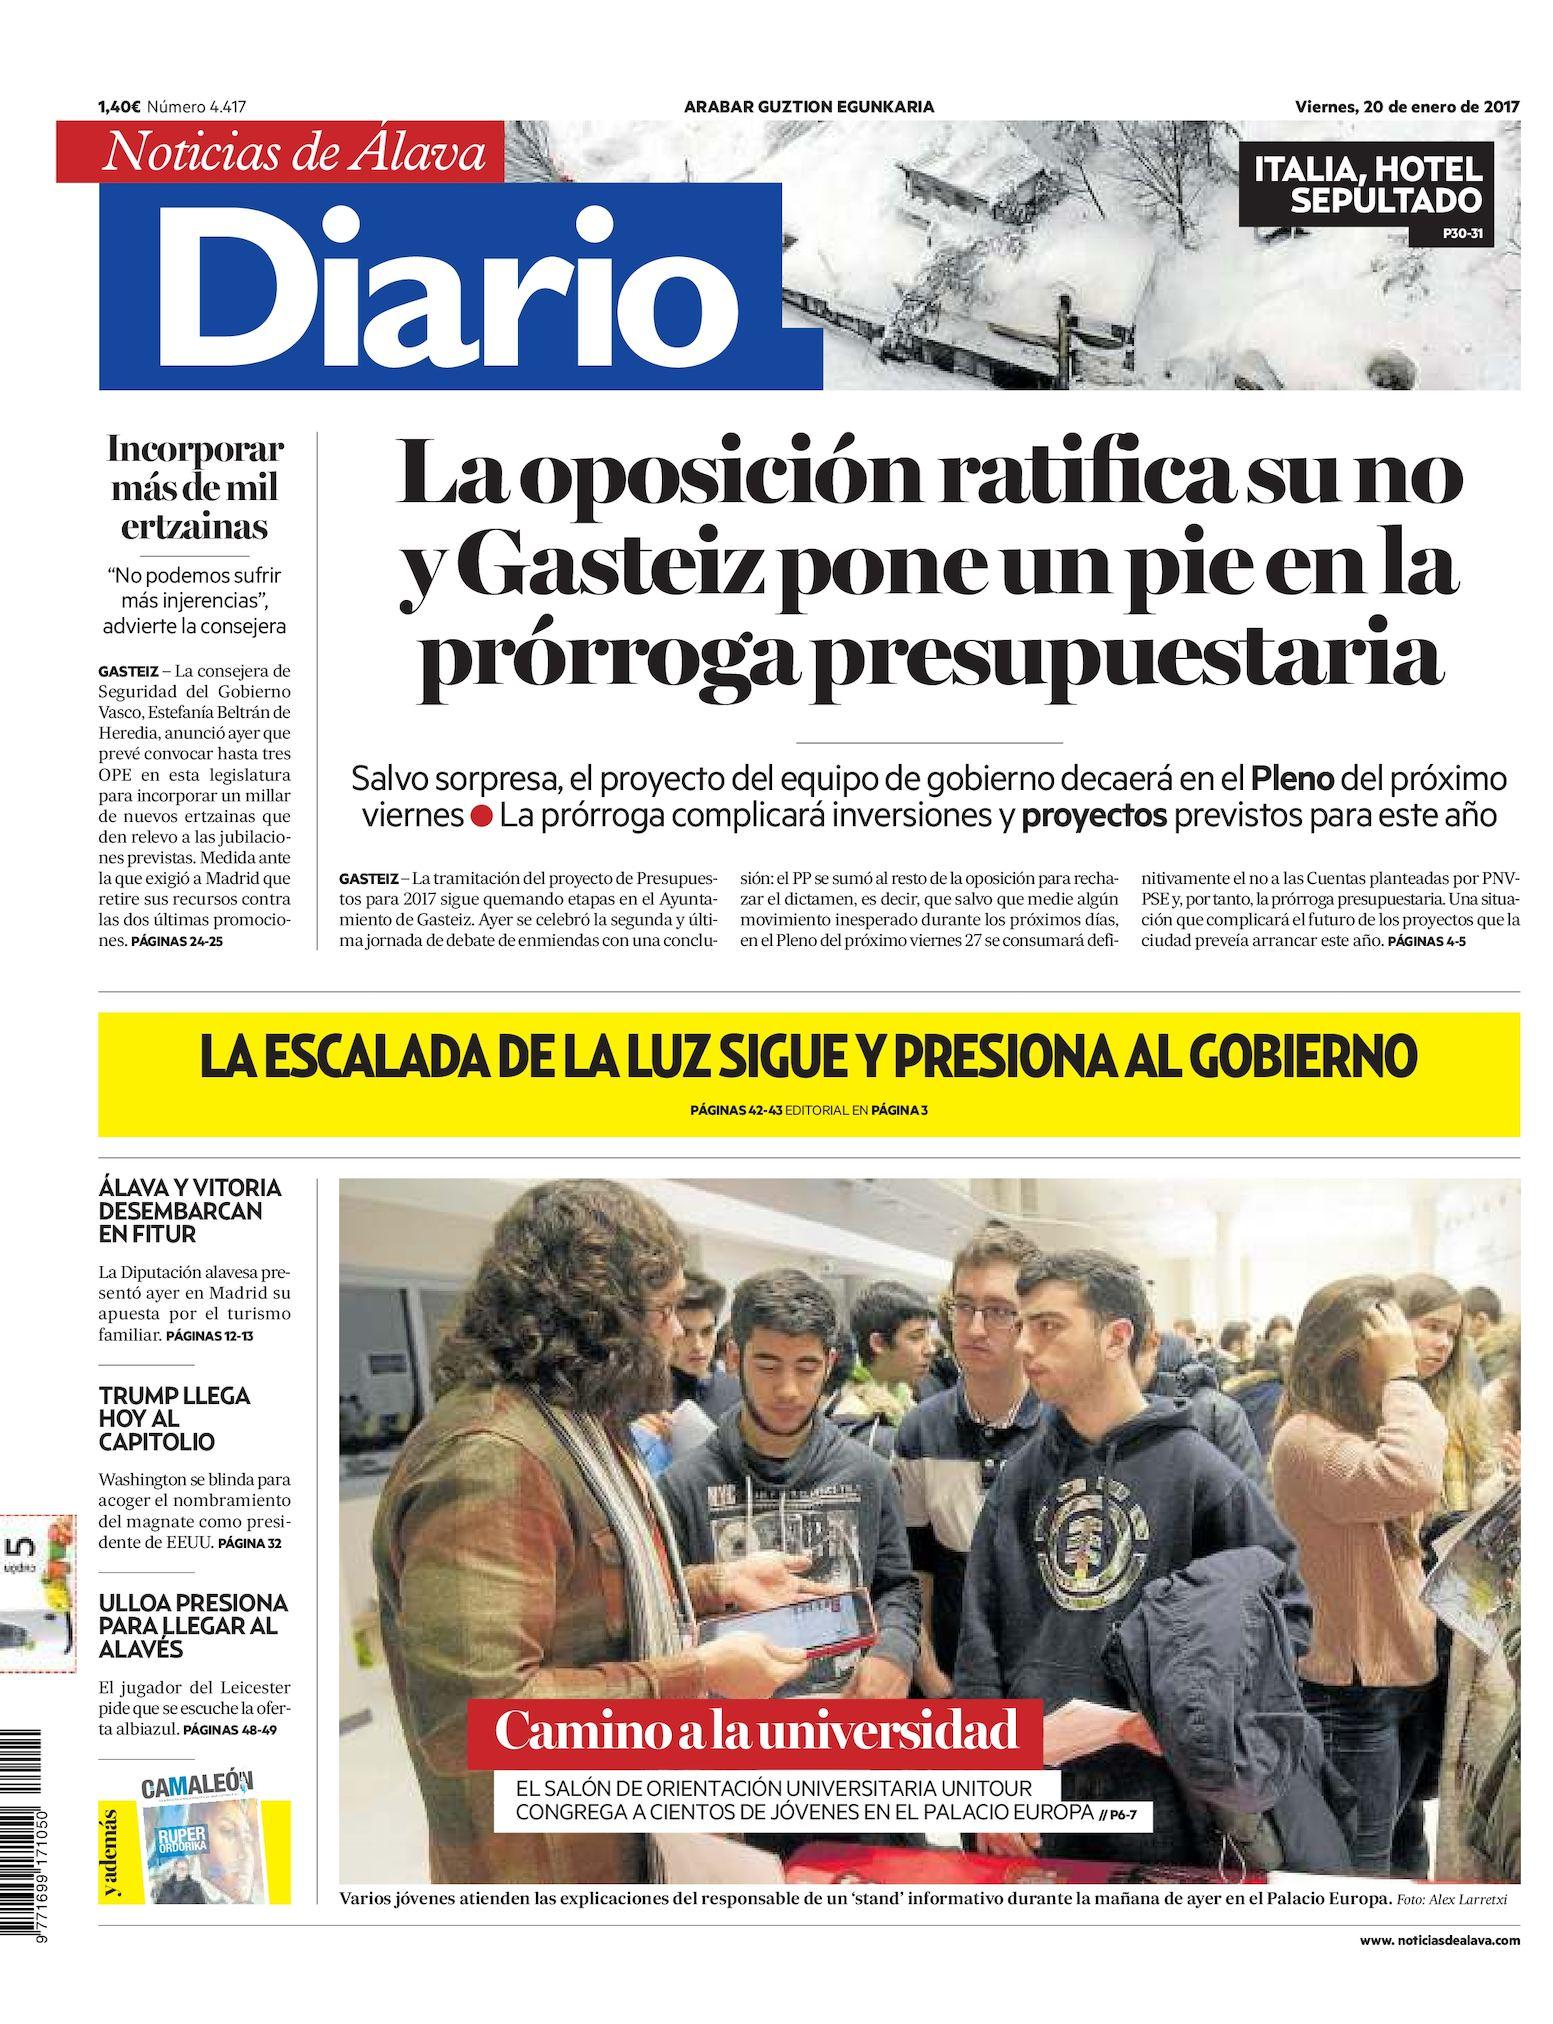 new styles ca015 2dd97 Calaméo - Diario de Noticias de Álava 20170120